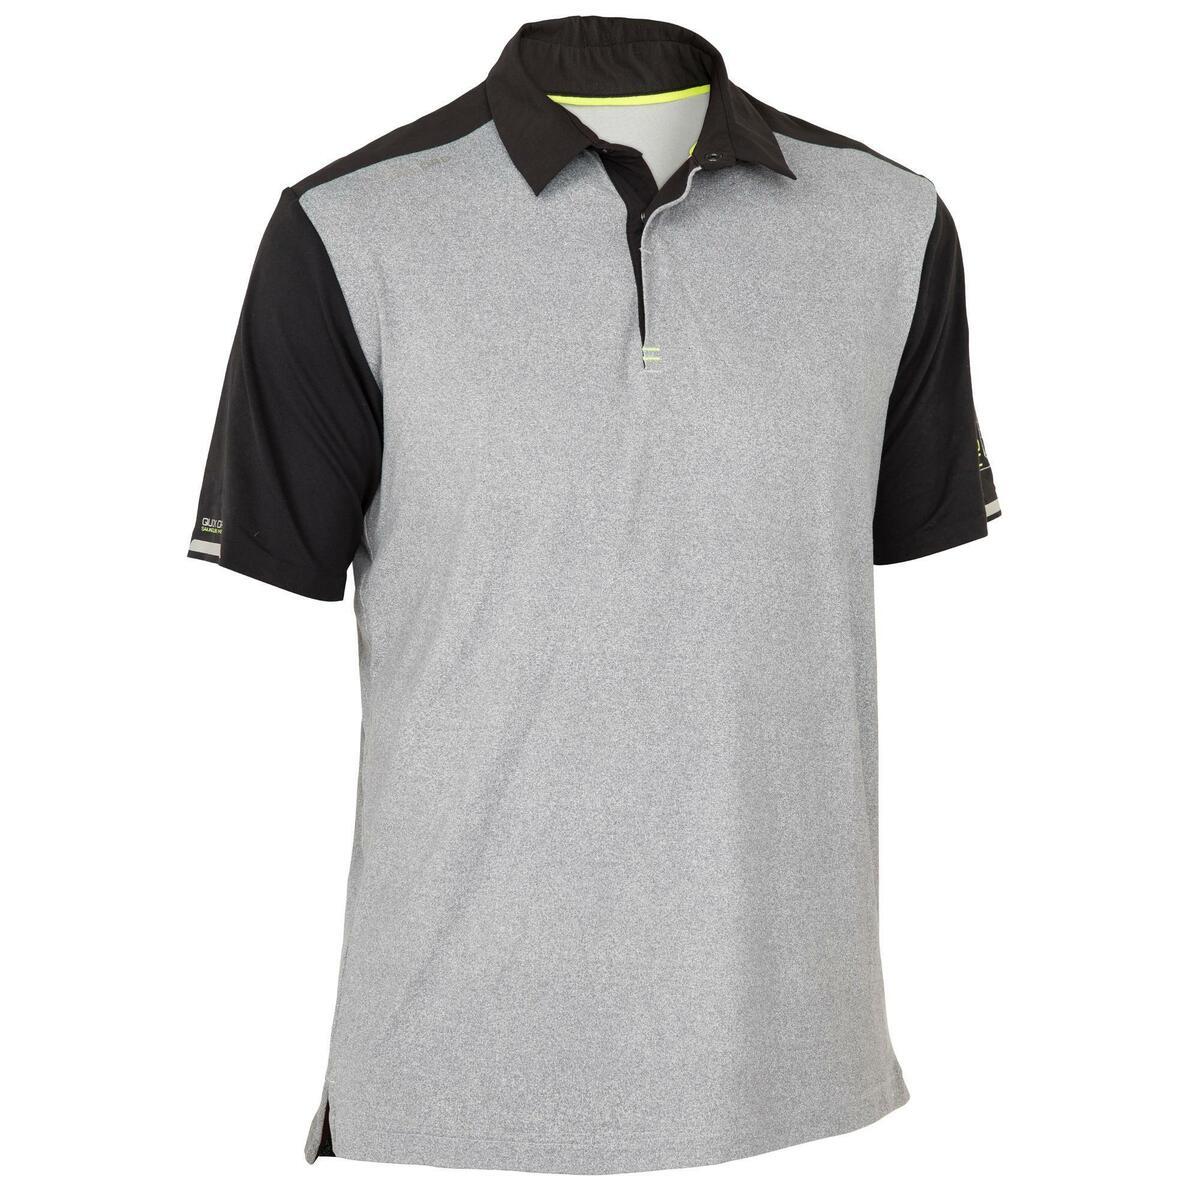 Bild 1 von Poloshirt kurzarm Segeln Race Herren grau meliert